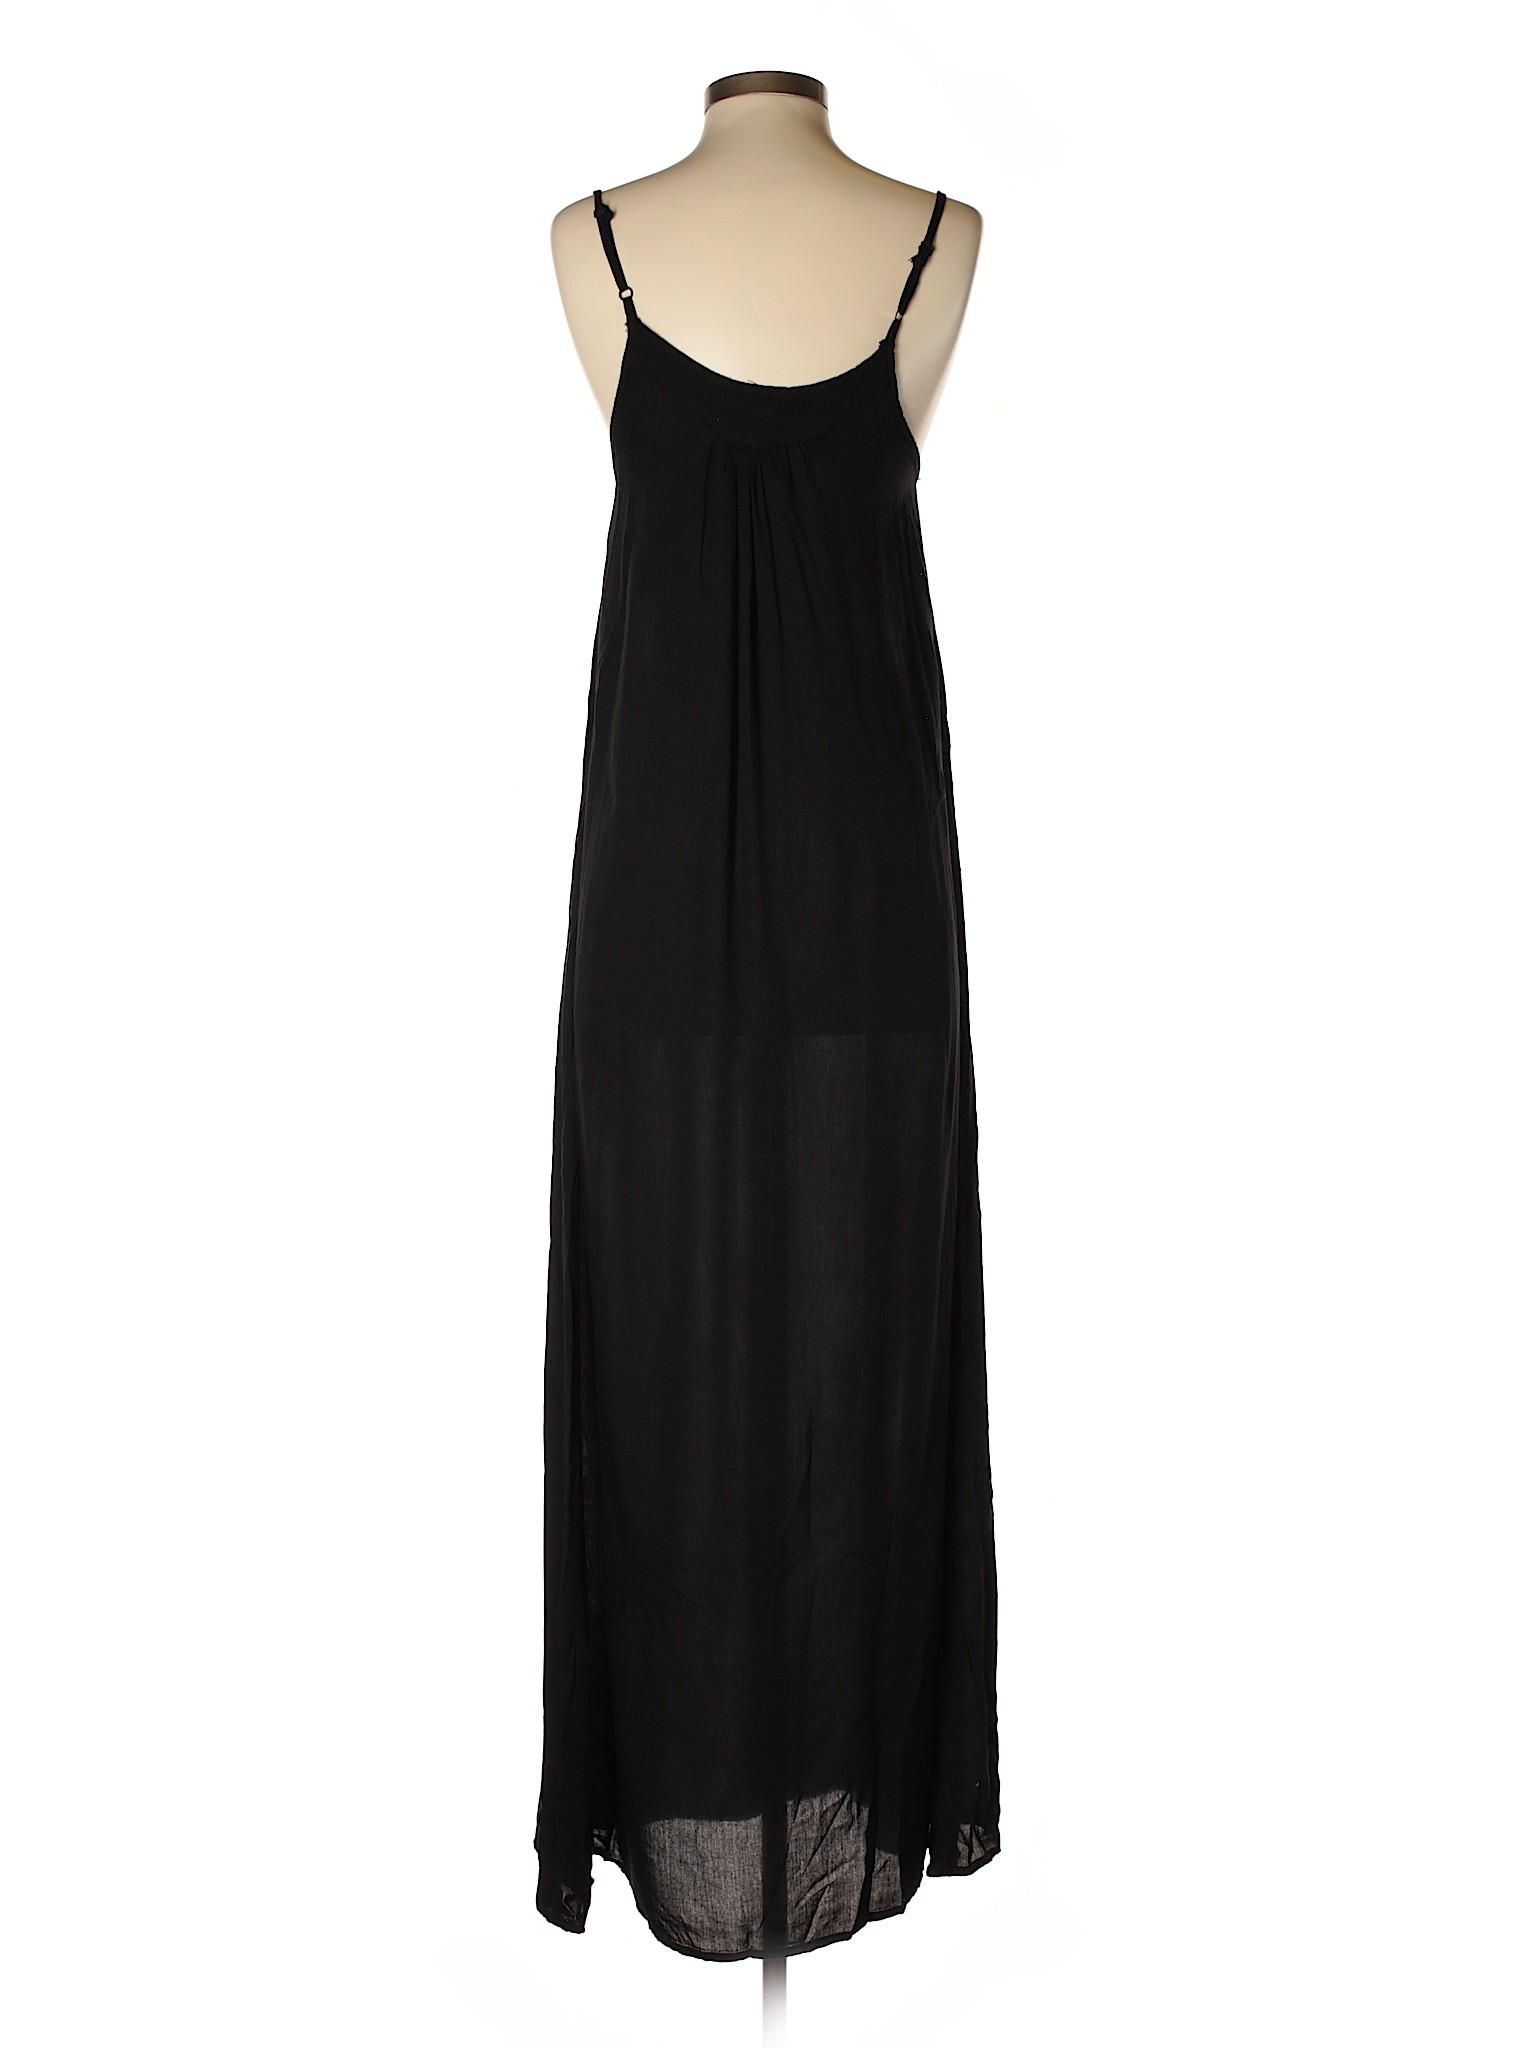 Dress Raviya Casual Selling Dress Selling Dress Casual Selling Selling Casual Raviya Raviya Dress Casual Raviya Raviya Selling EwFSqASp6R